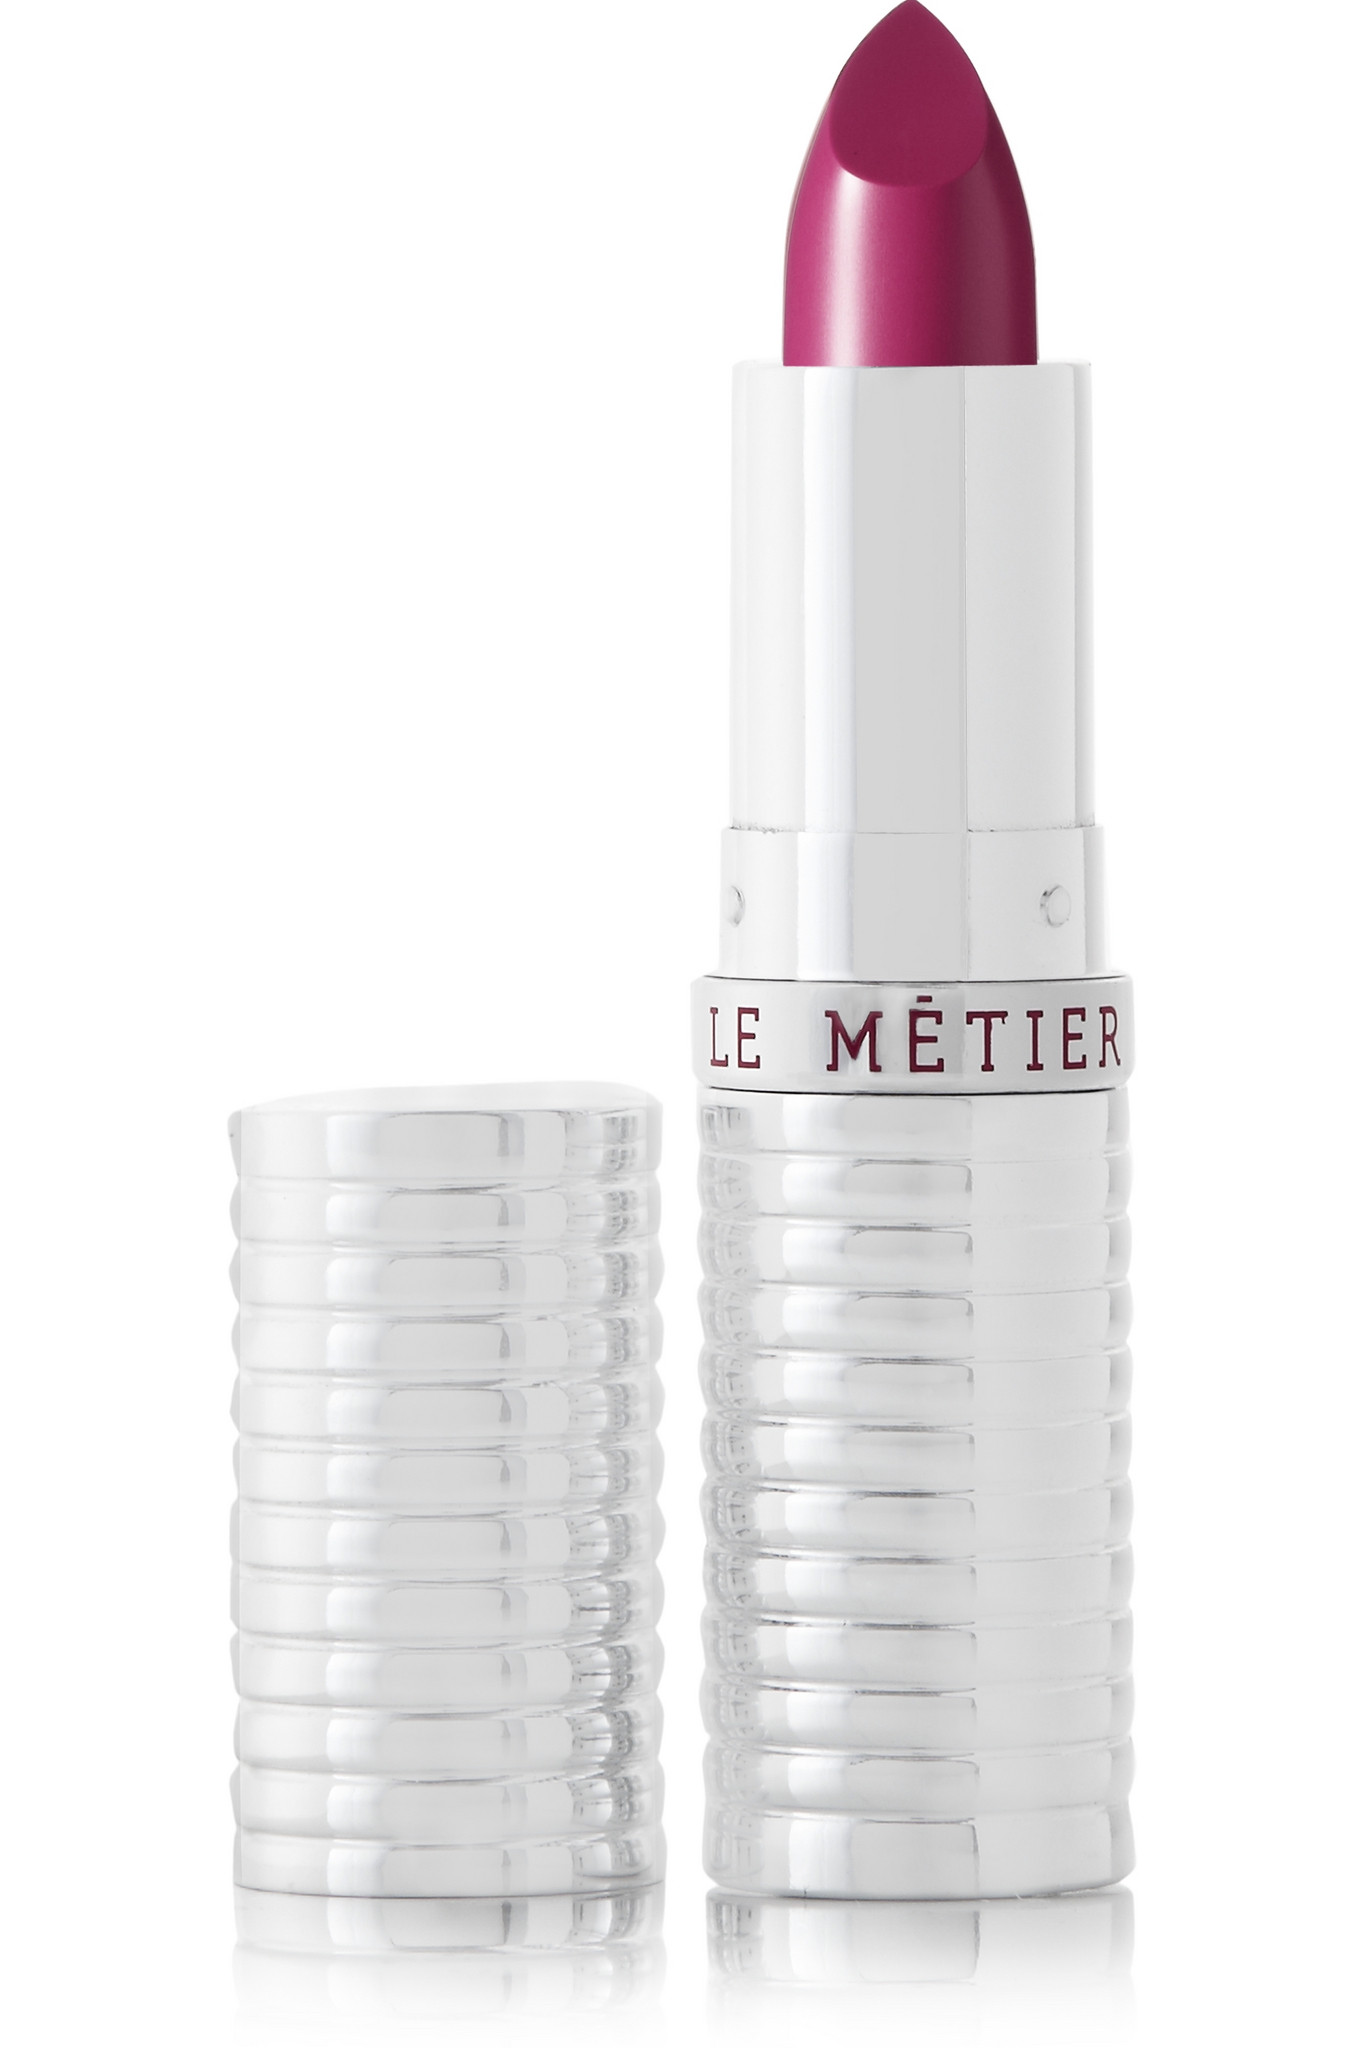 Le Metier de Beaute Hydra-Creme Lipstick in Think Pink (neimanmarcus.com, $25)